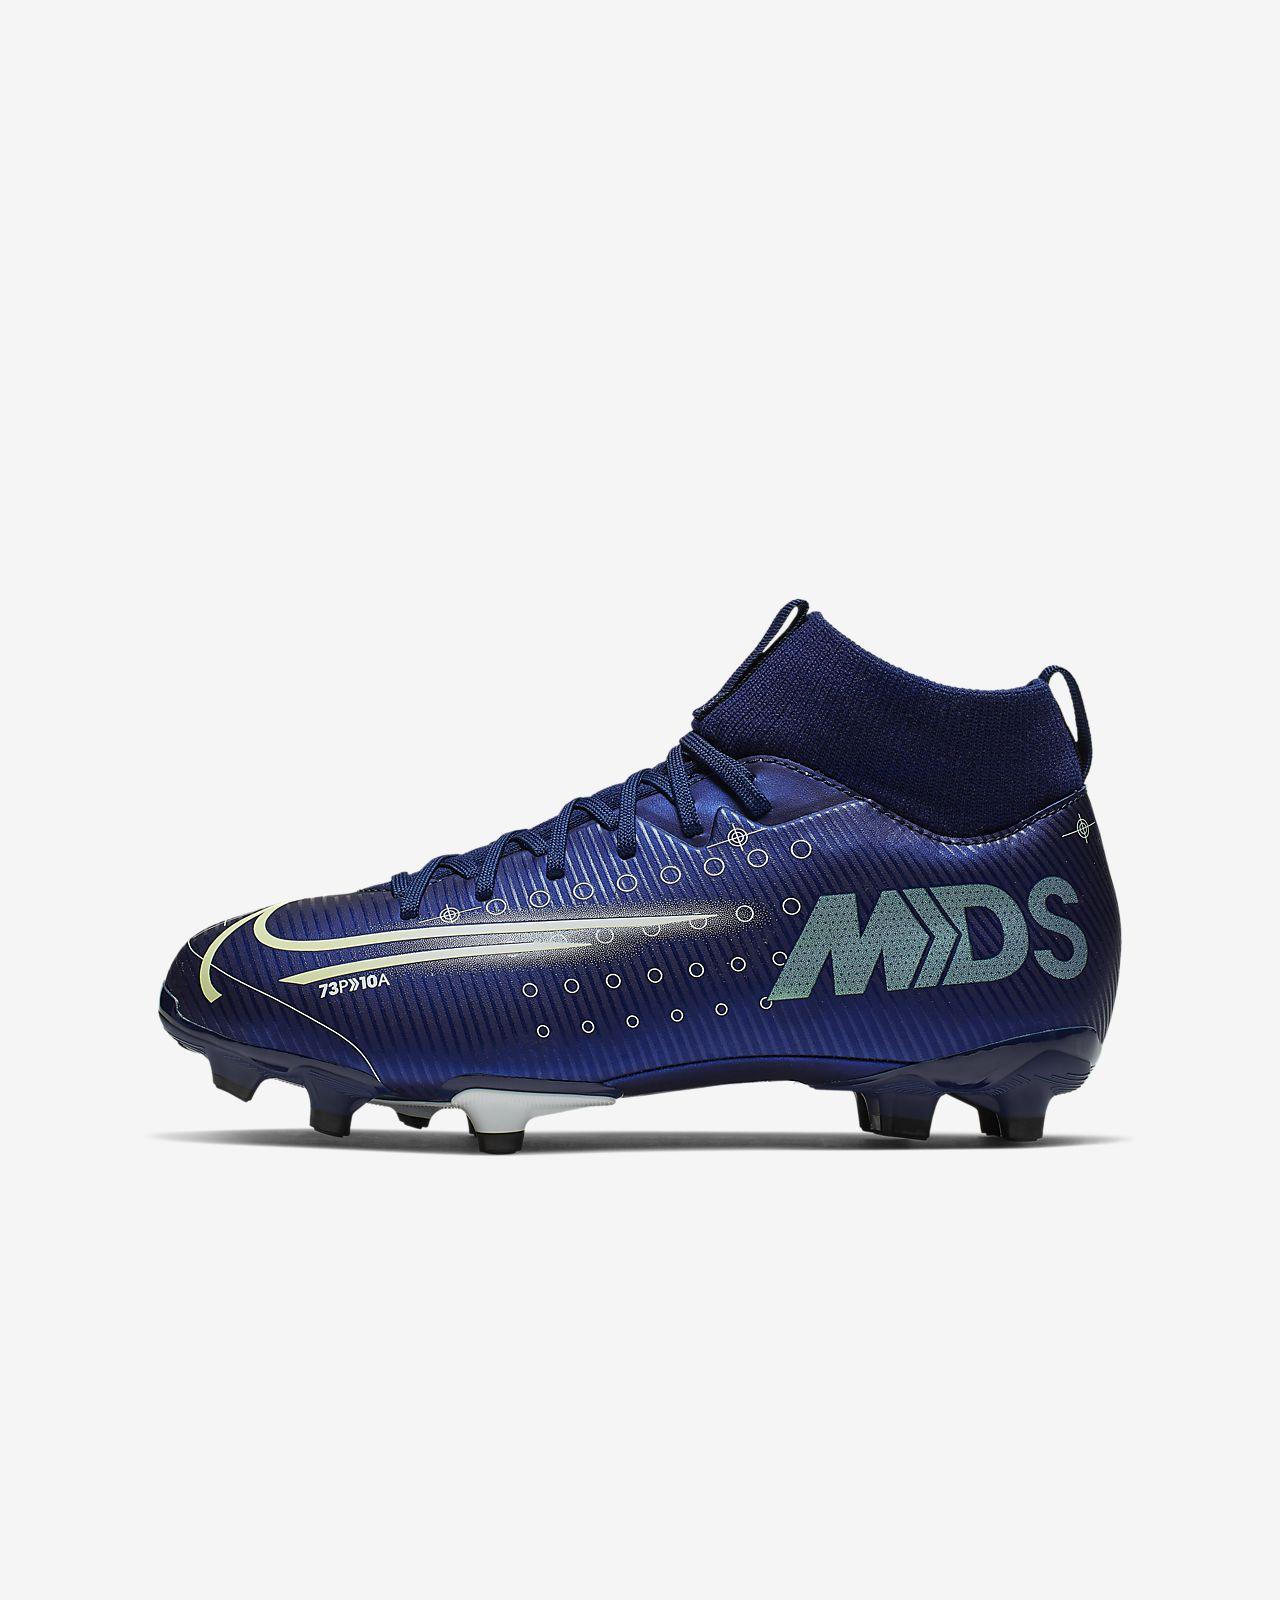 Nike Jr. Mercurial Superfly 7 Academy MDS MG Botas de fútbol multisuperficie - Niño/a y niño/a pequeño/a